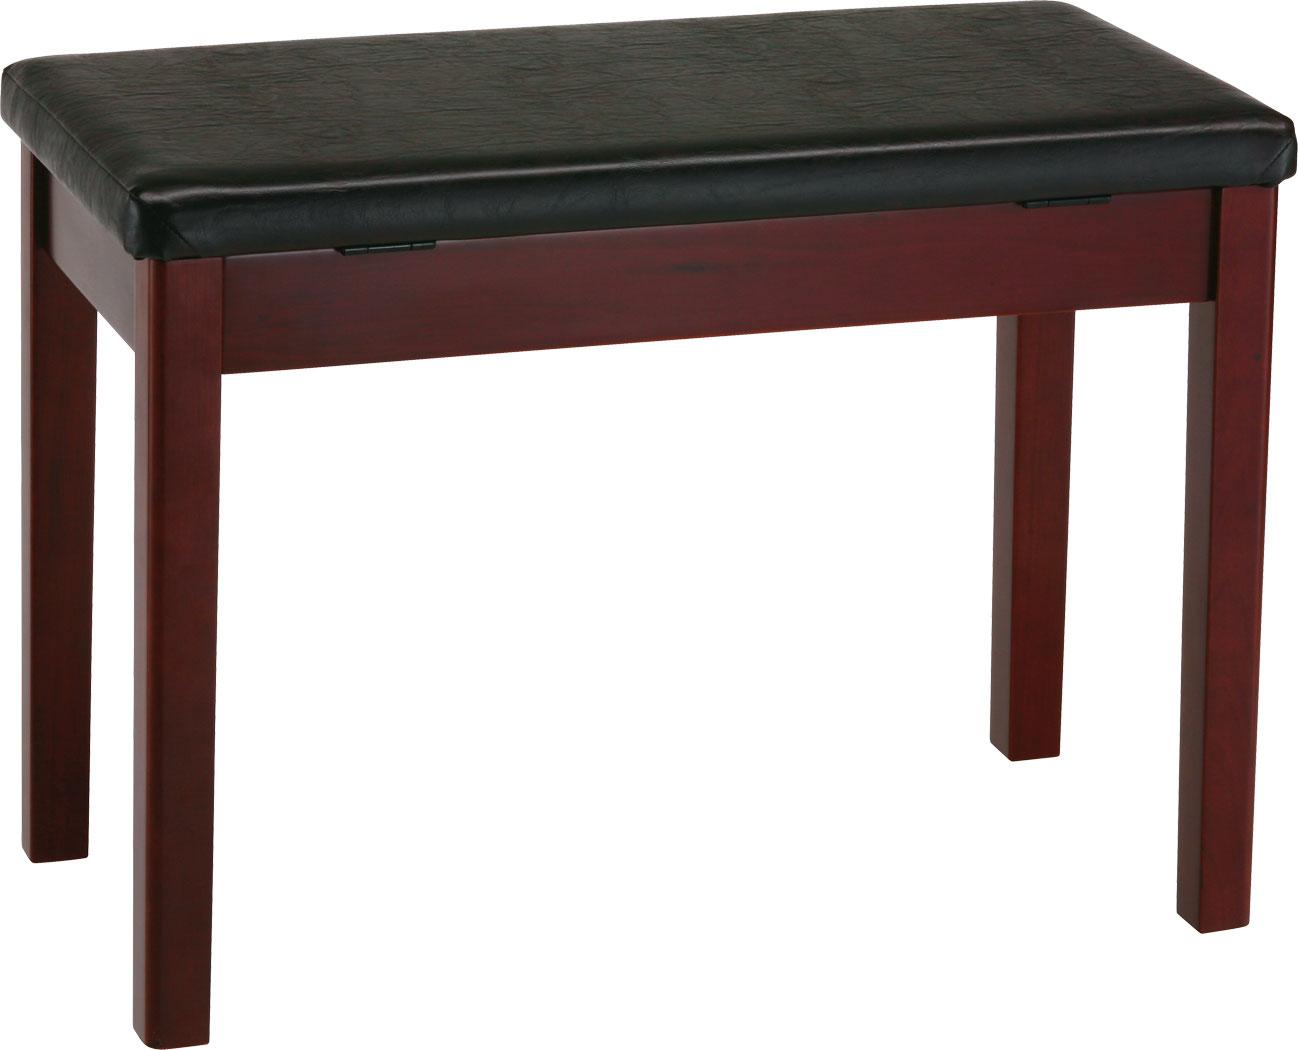 Roland Bnc 37 Piano Bench